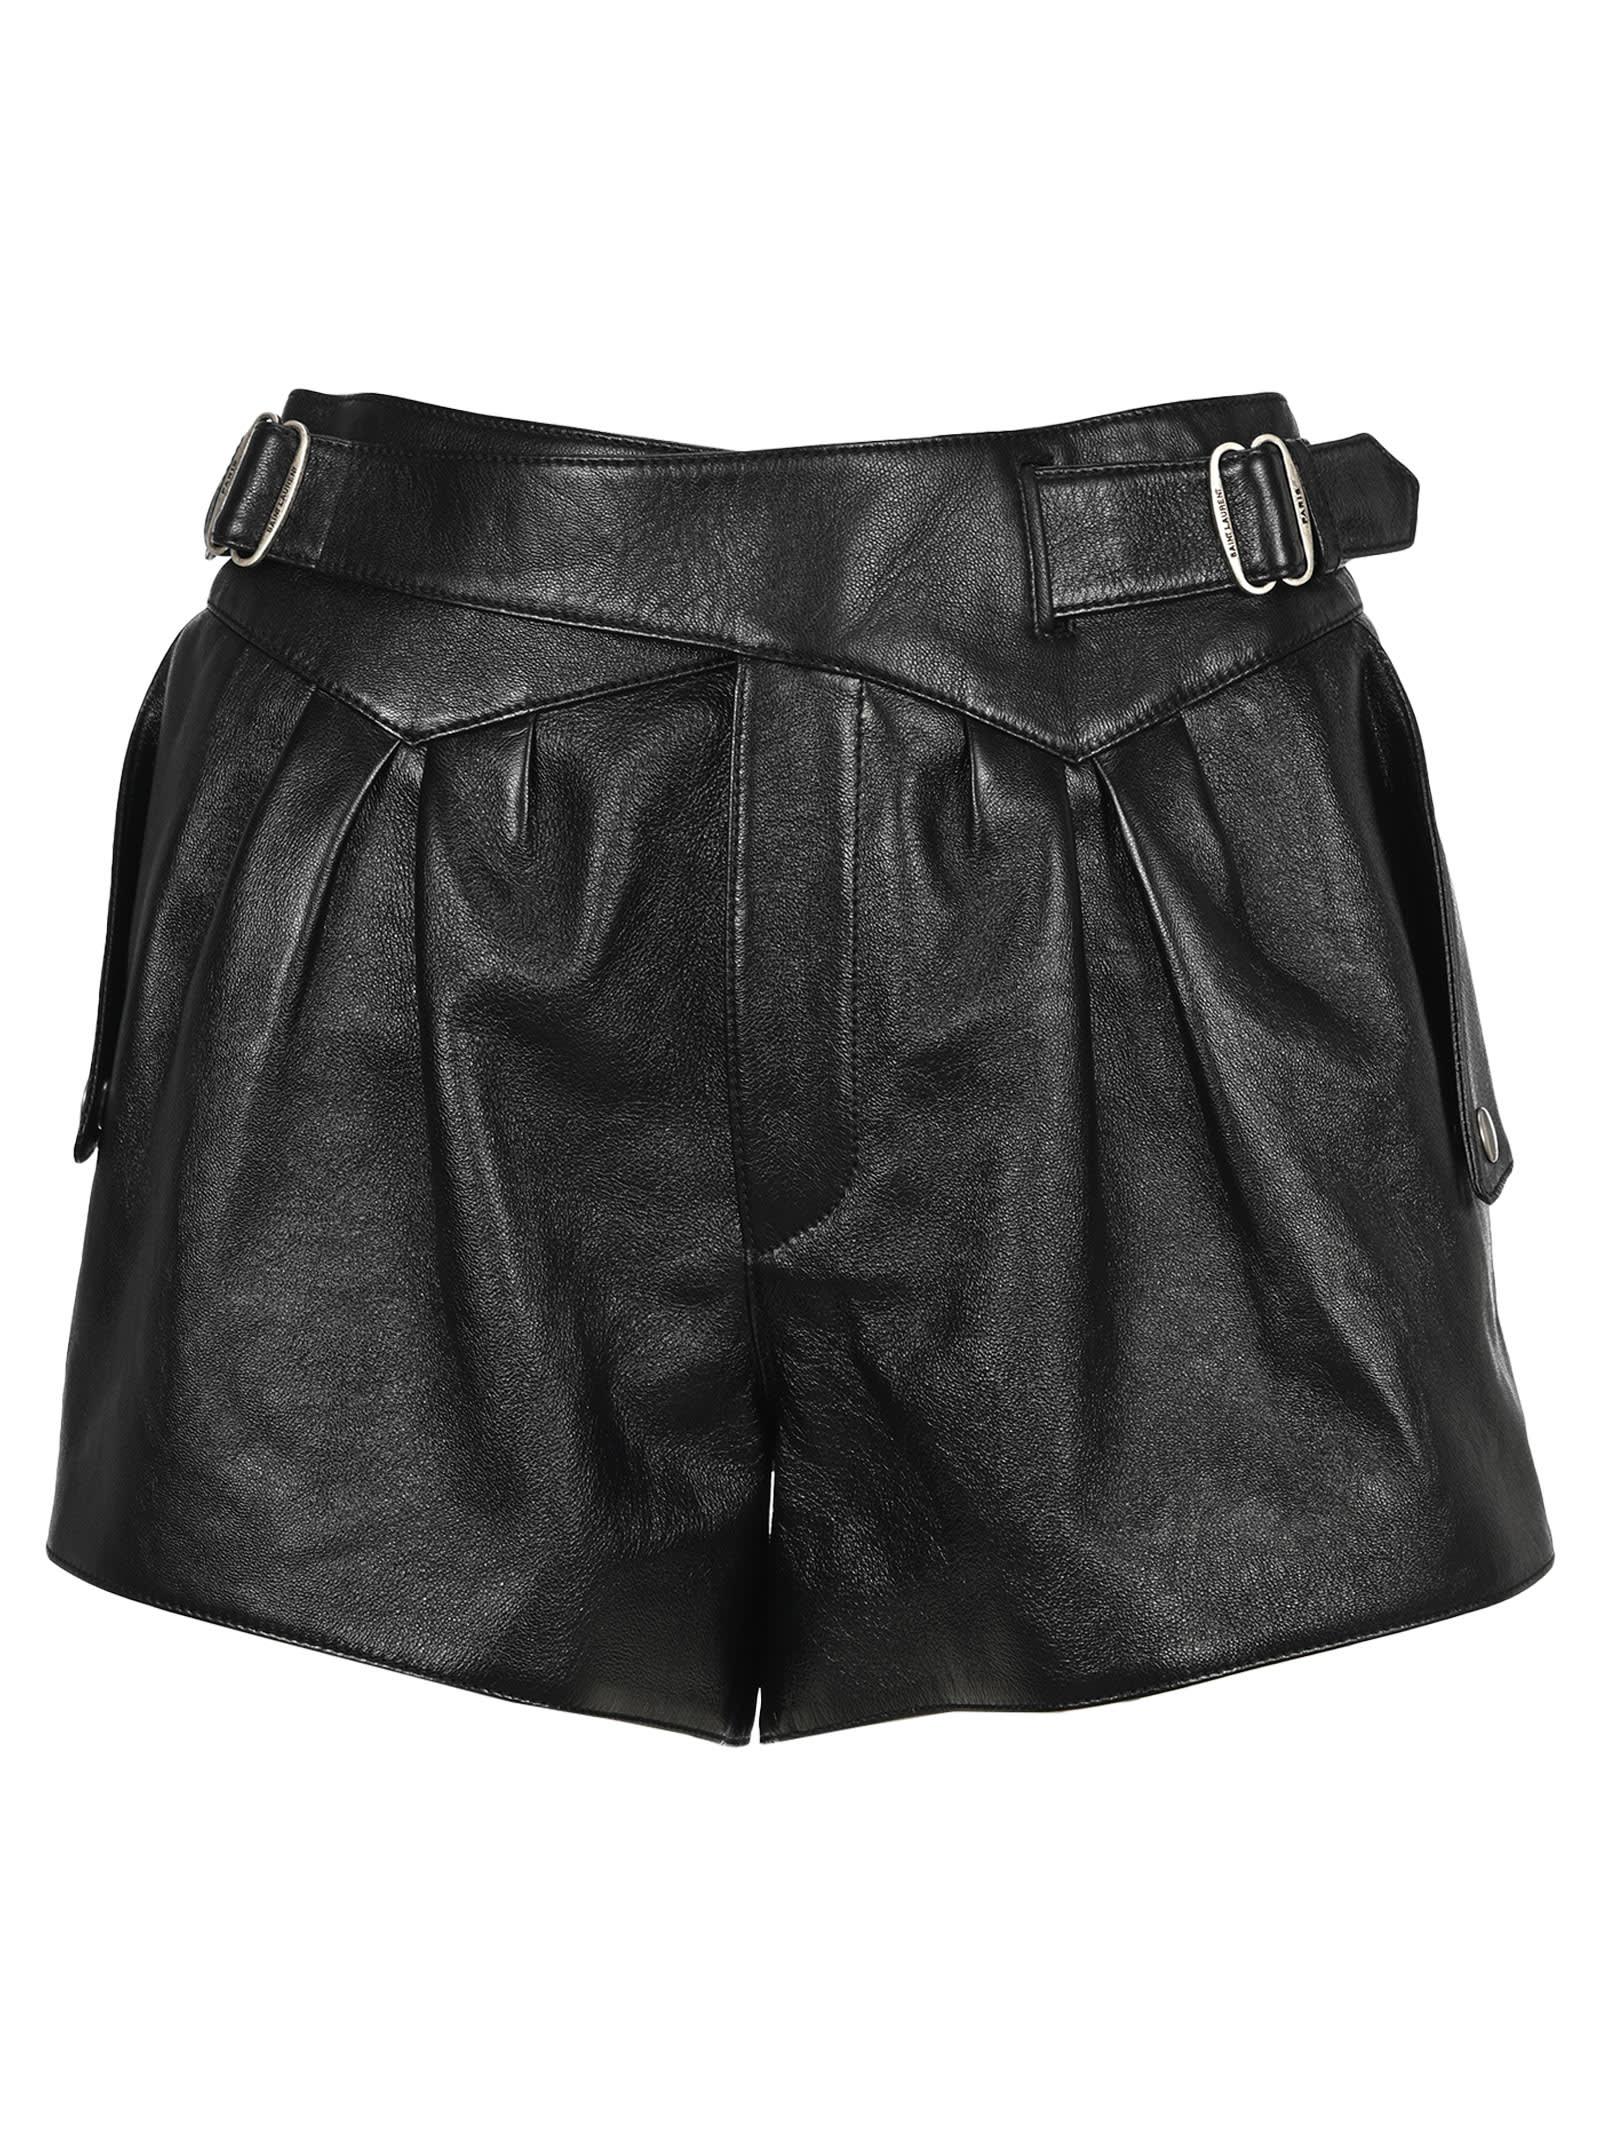 Saint Laurent High-rise Shorts